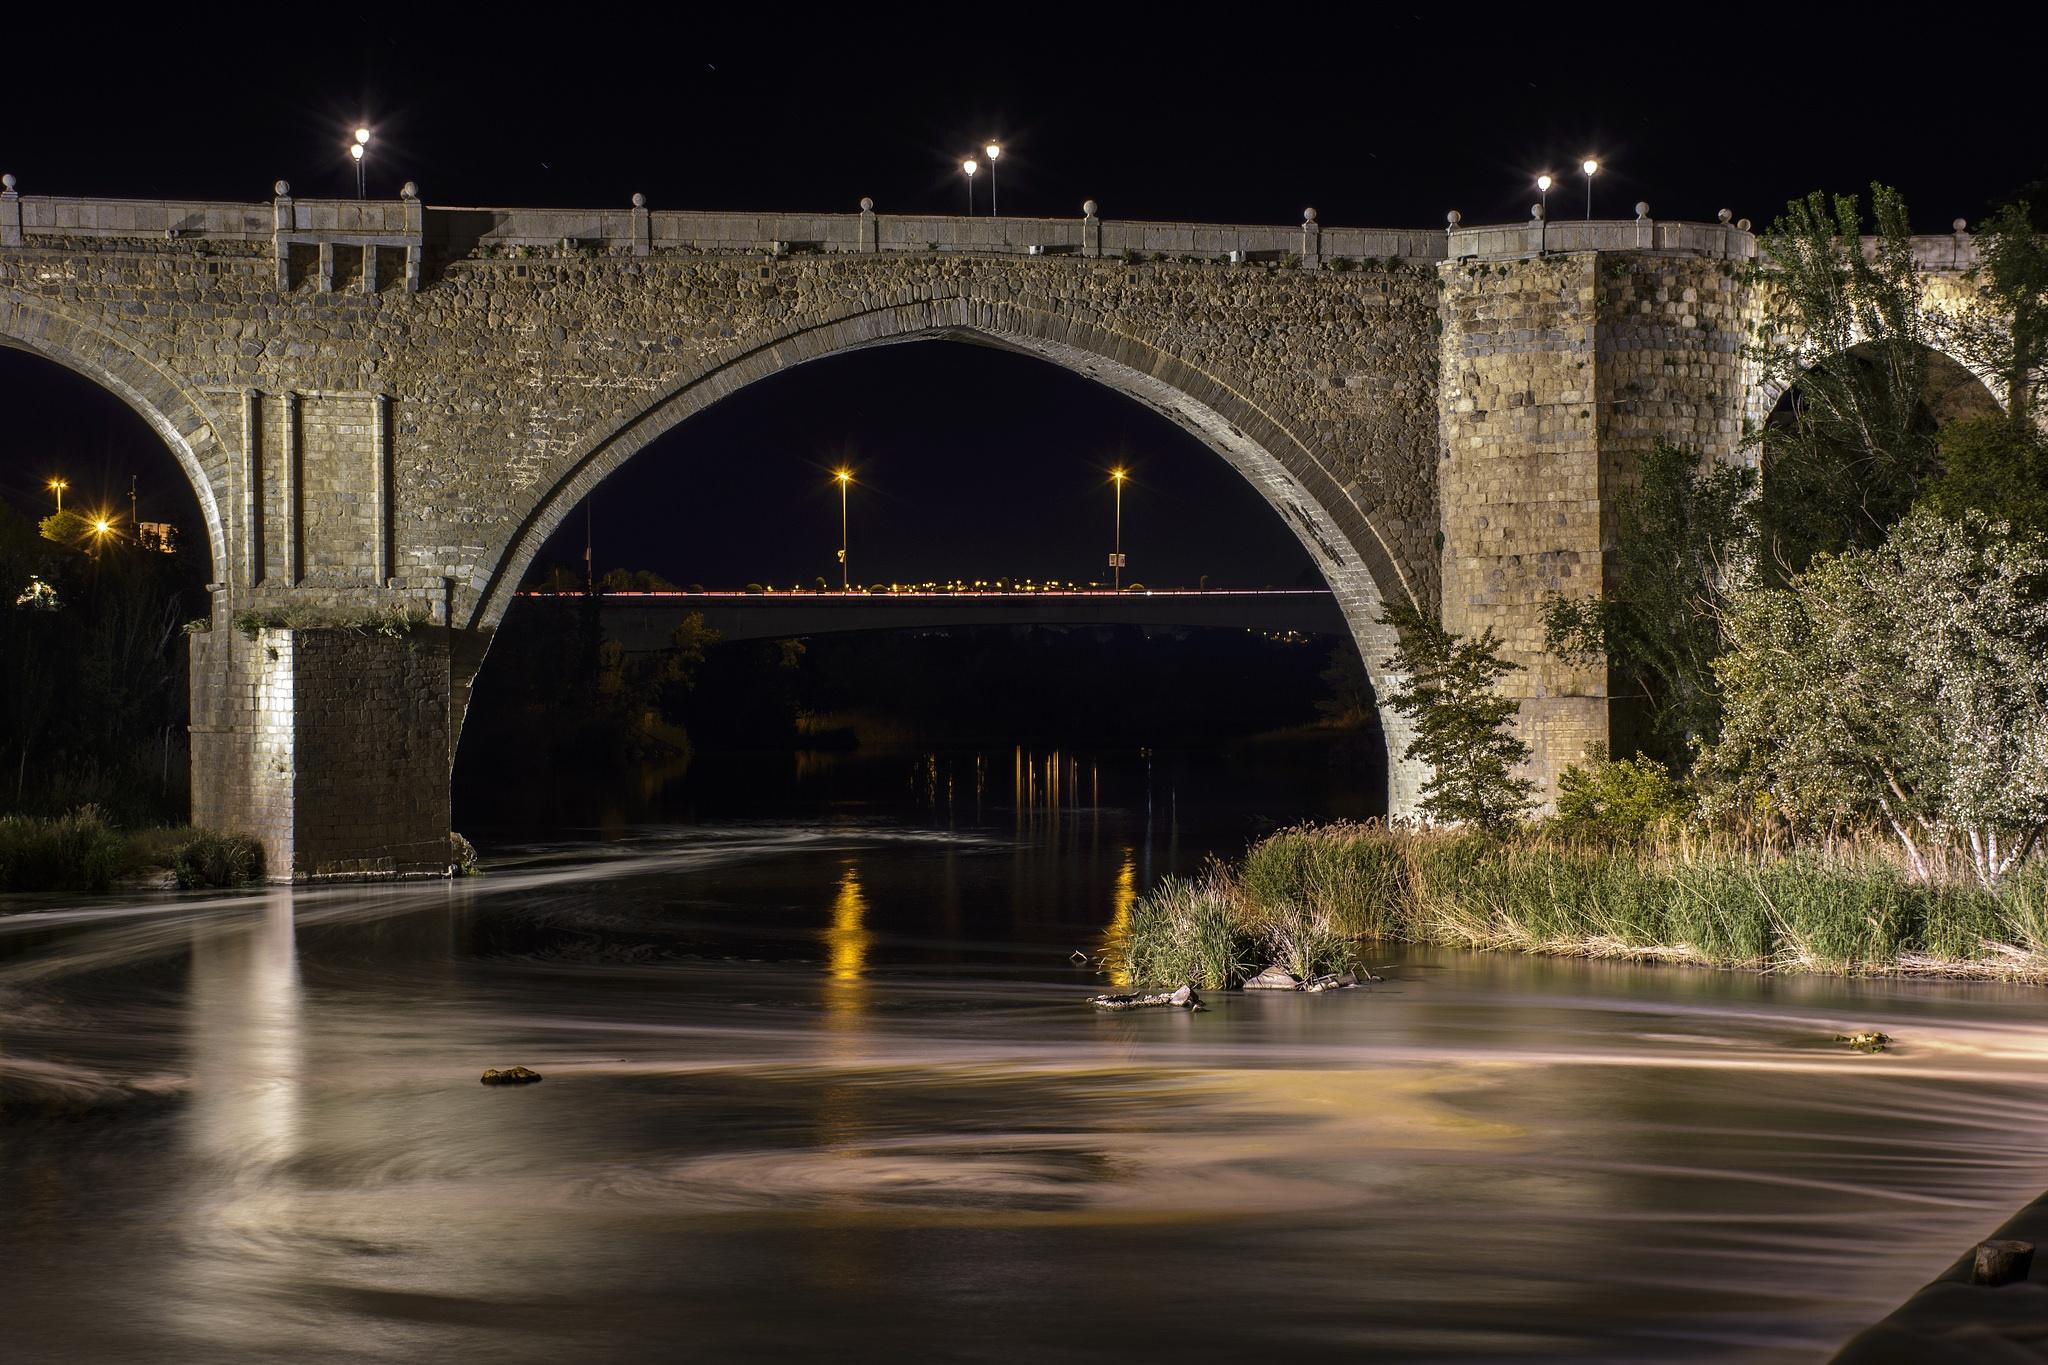 Puente de San Martin by Rodri